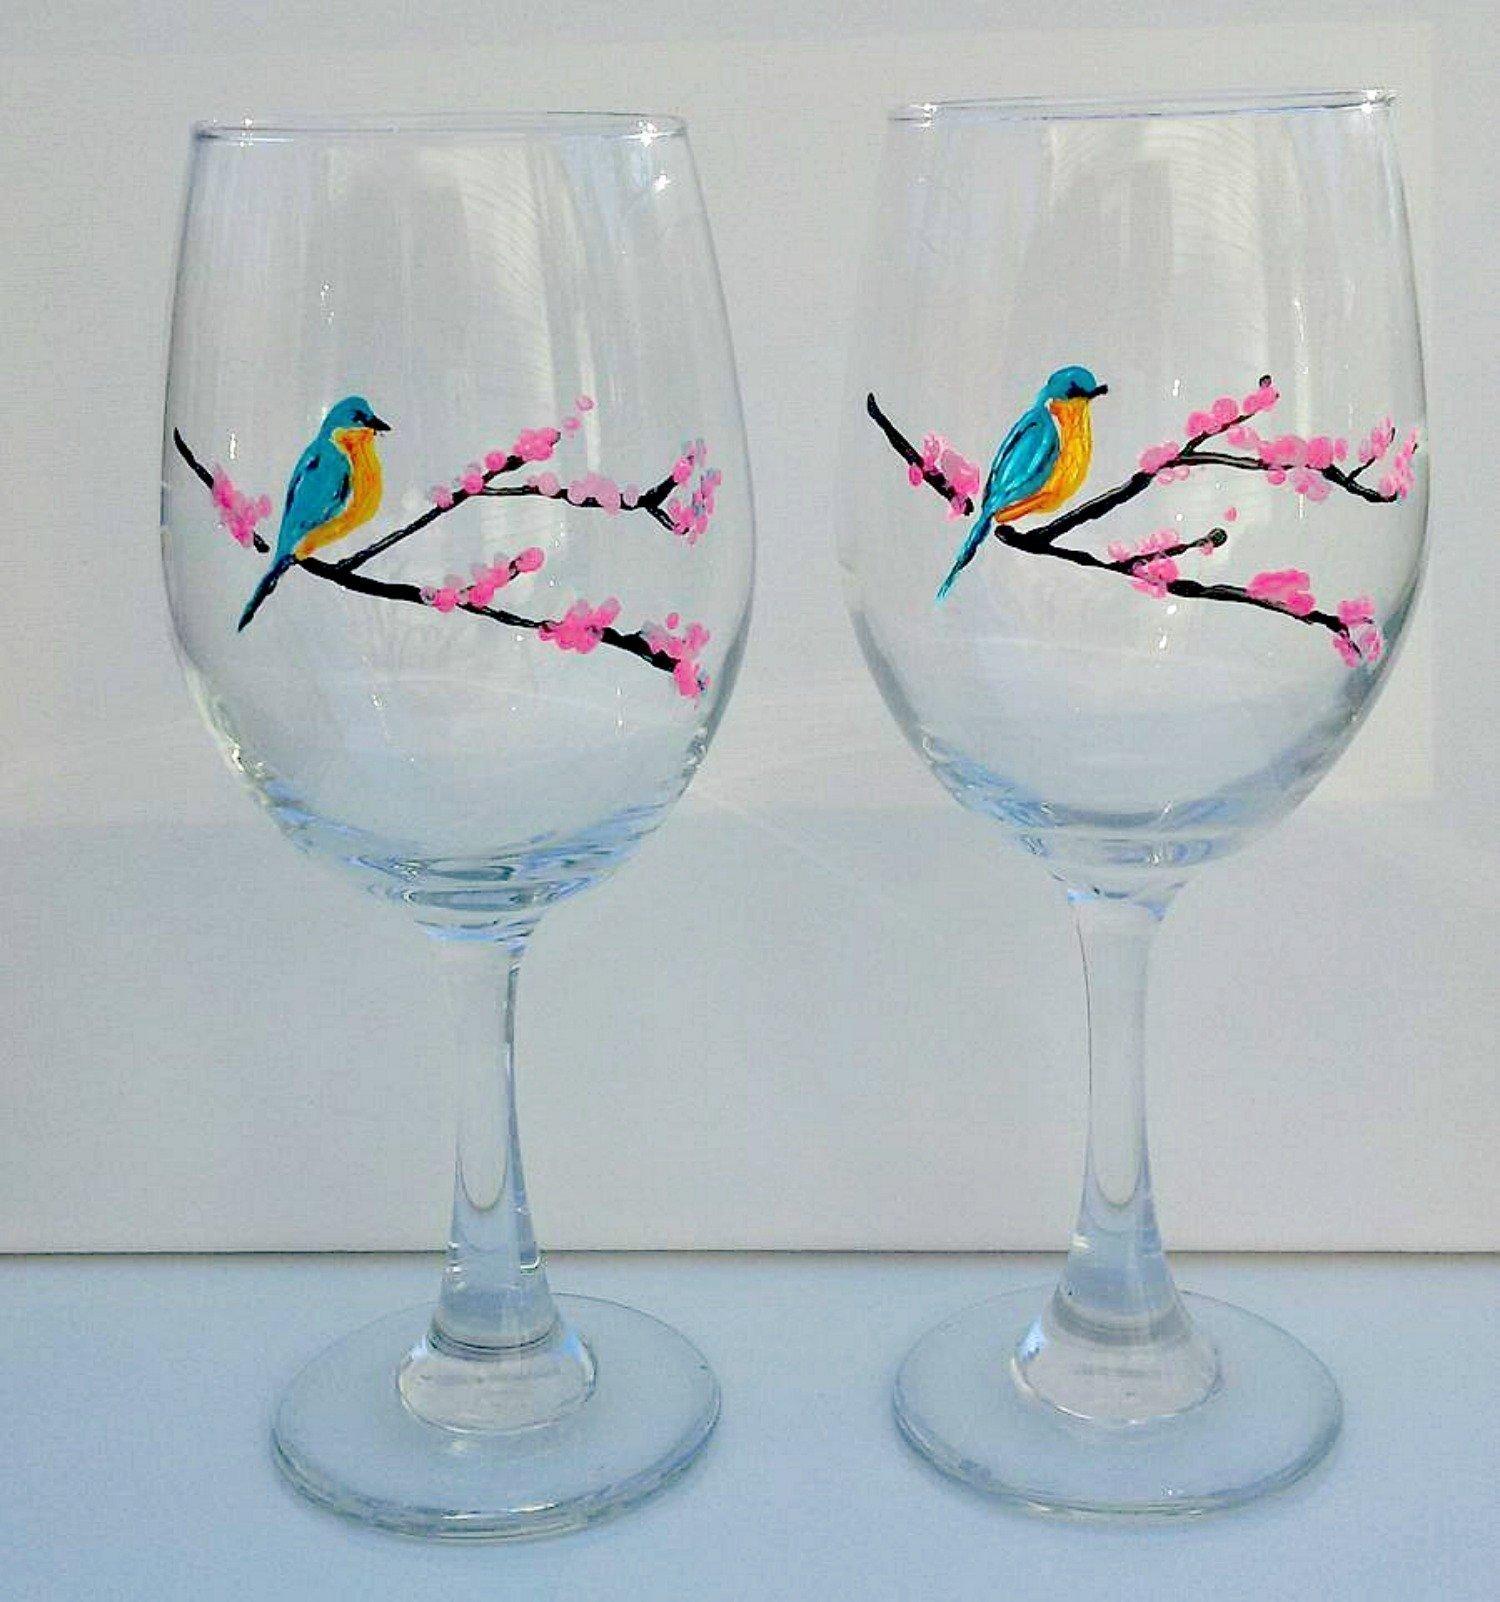 Bluebird & Pink Cherry Tree Branches (Set Of 2) Hand Painted Wine Glasses,Bird Kitchen Decor